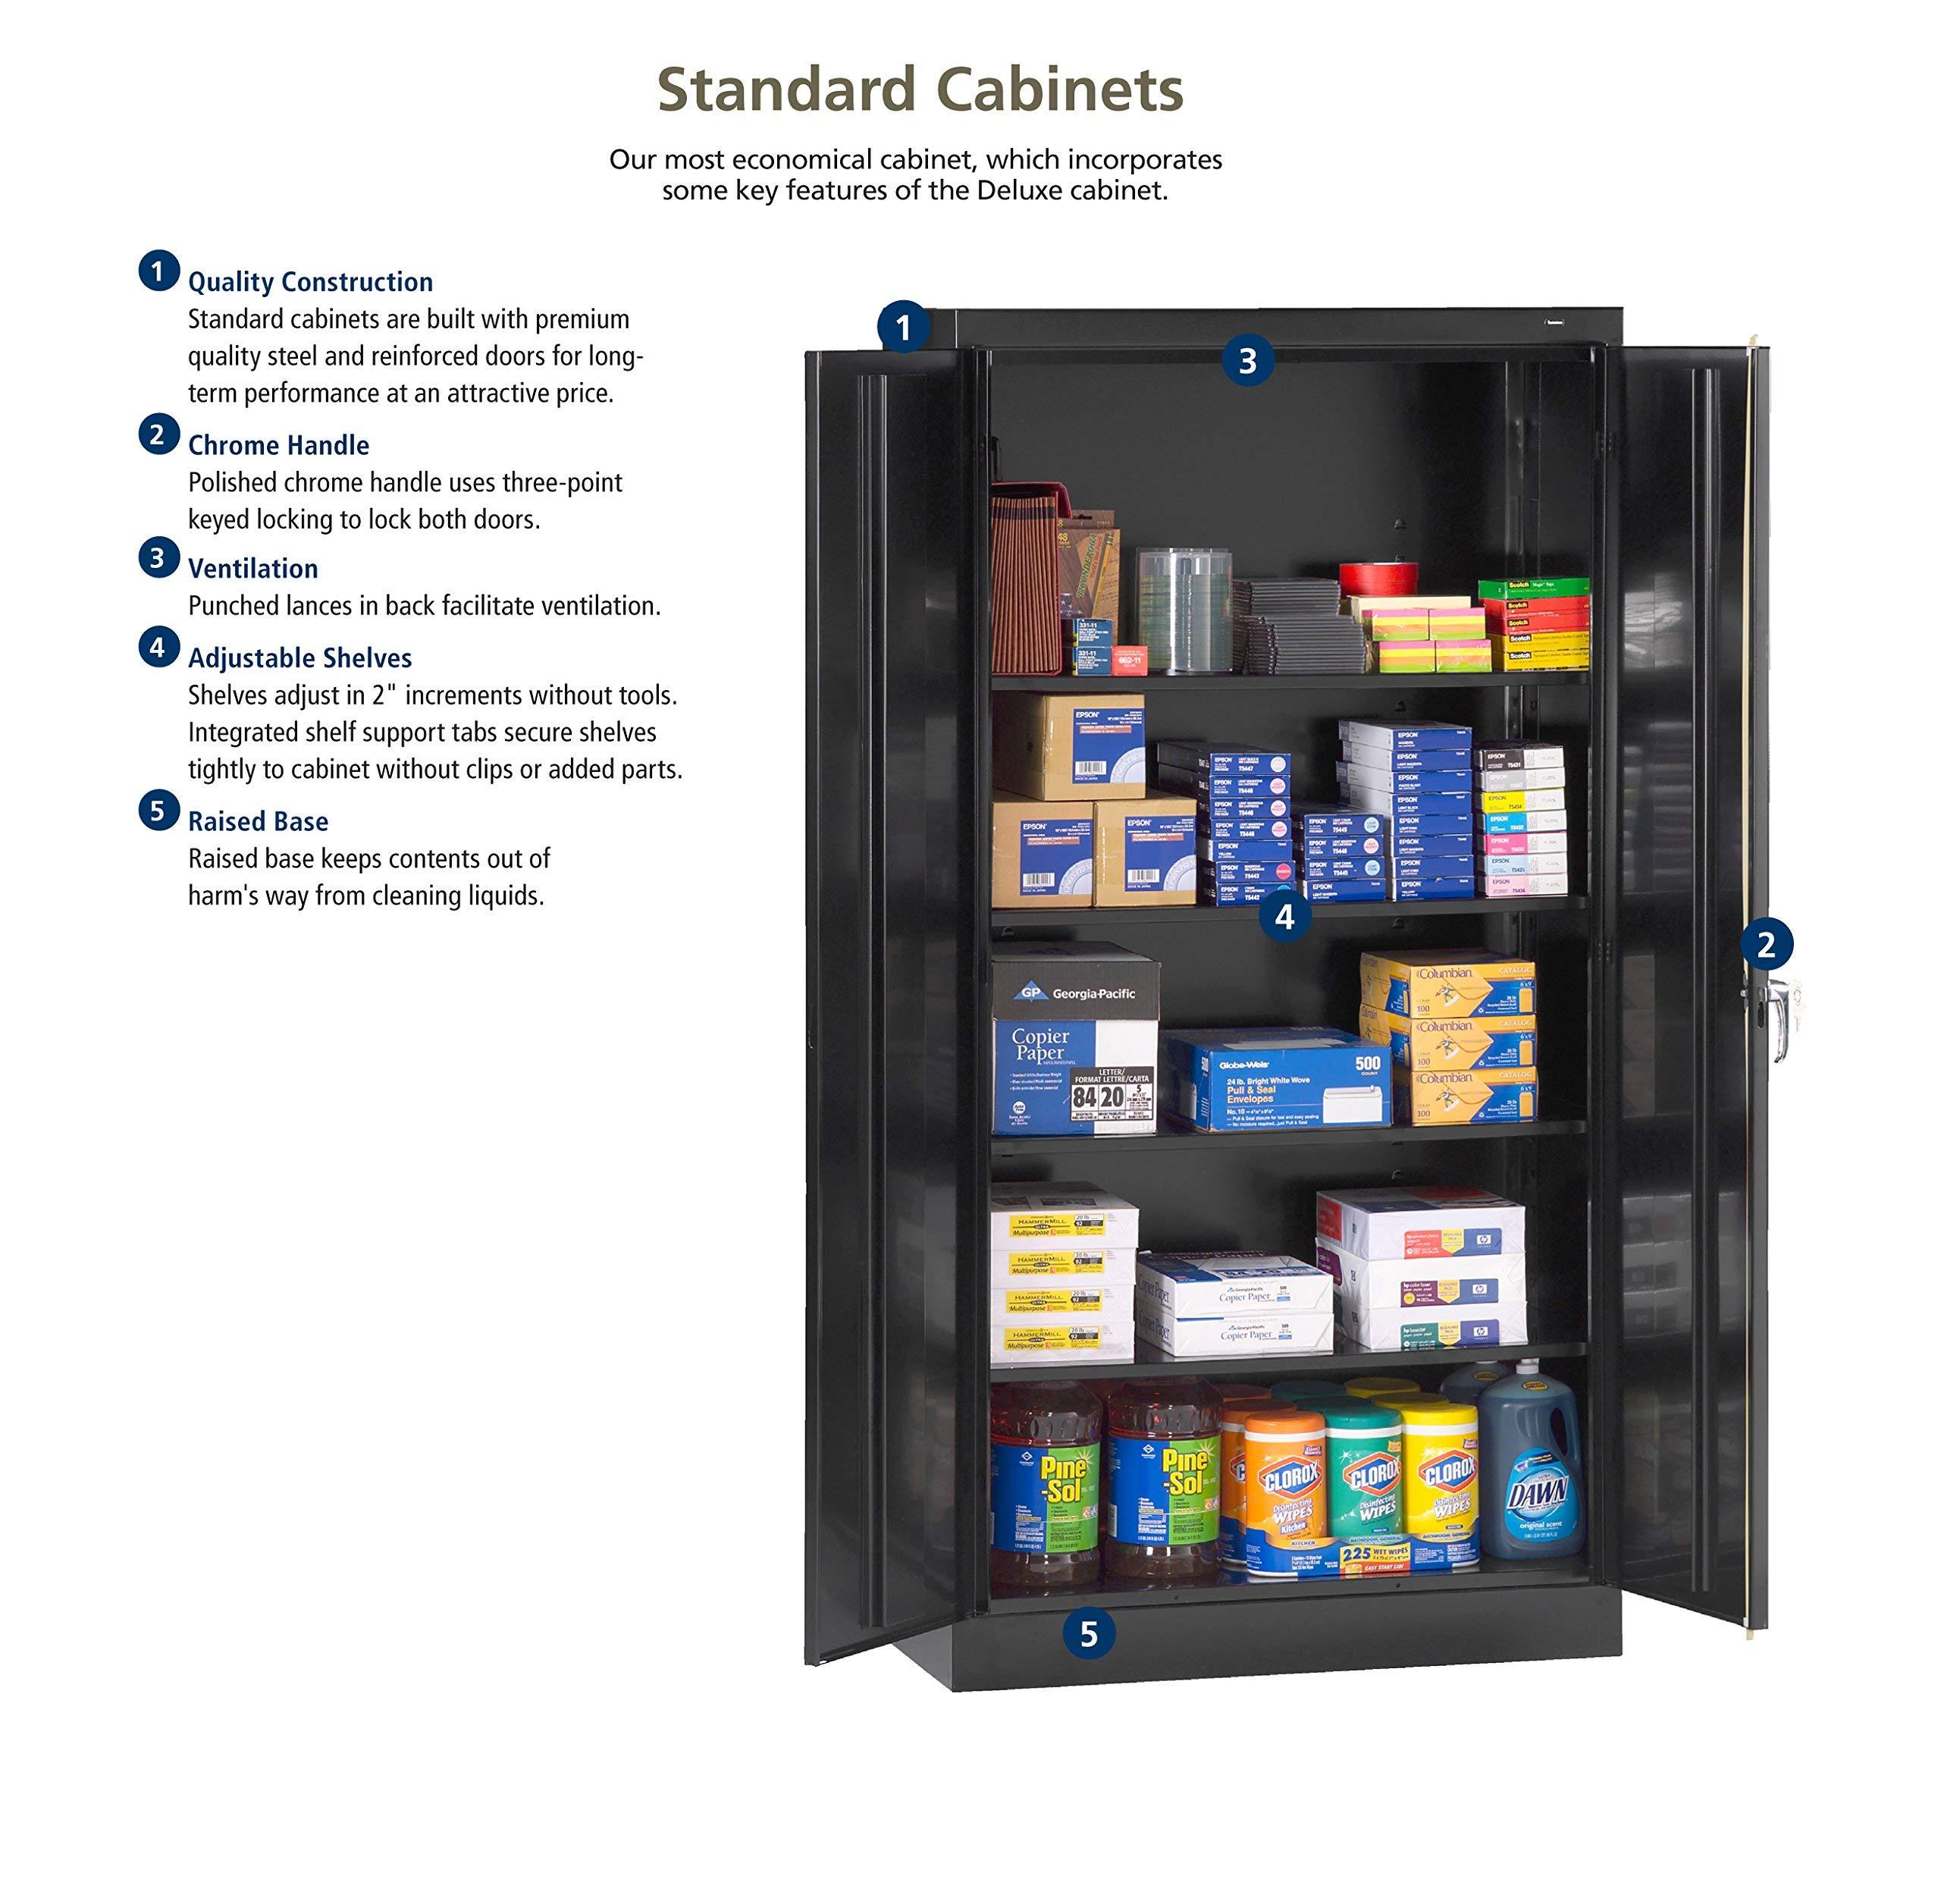 Tennsco 4218 24 Gauge Steel Standard Welded Counter High Cabinet, 2 Shelves, 150 lbs Capacity per Shelf, 36'' Width x 42'' Height x 18'' Depth, Black (Renewed) by Tennsco (Image #6)